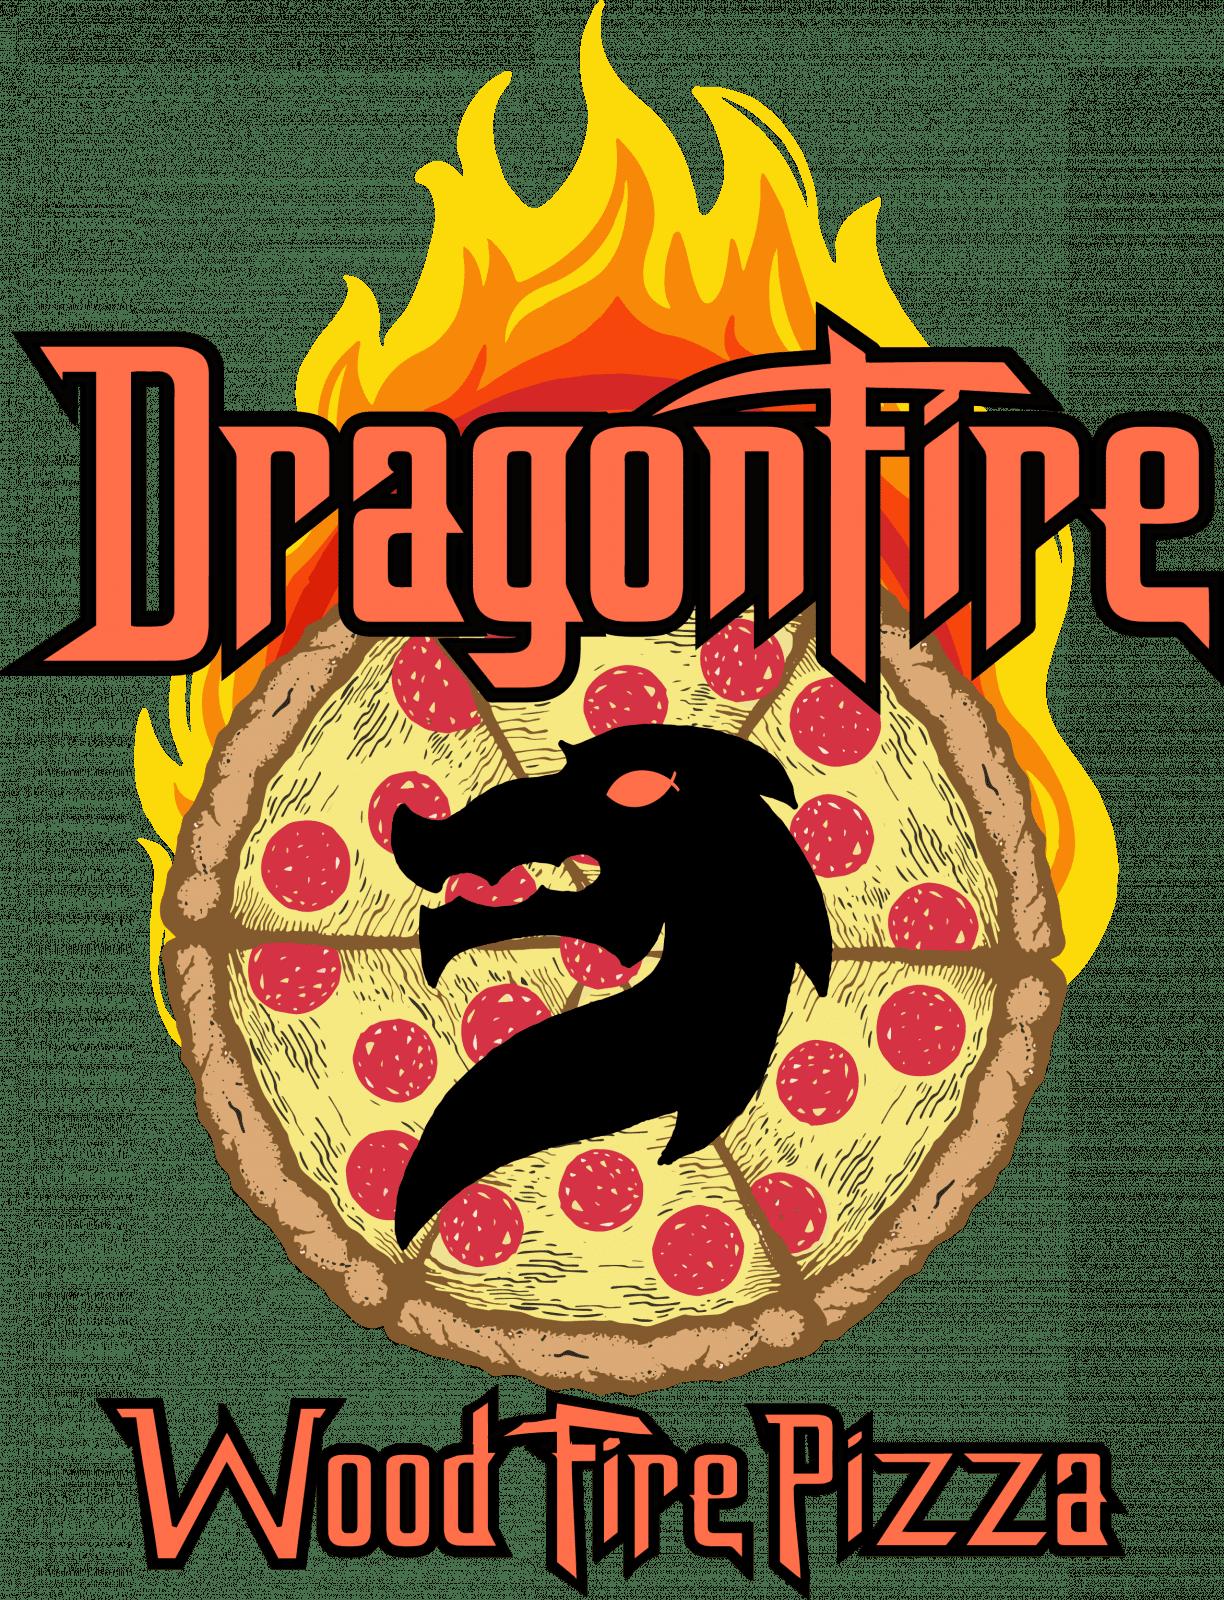 DragonFire Pizza